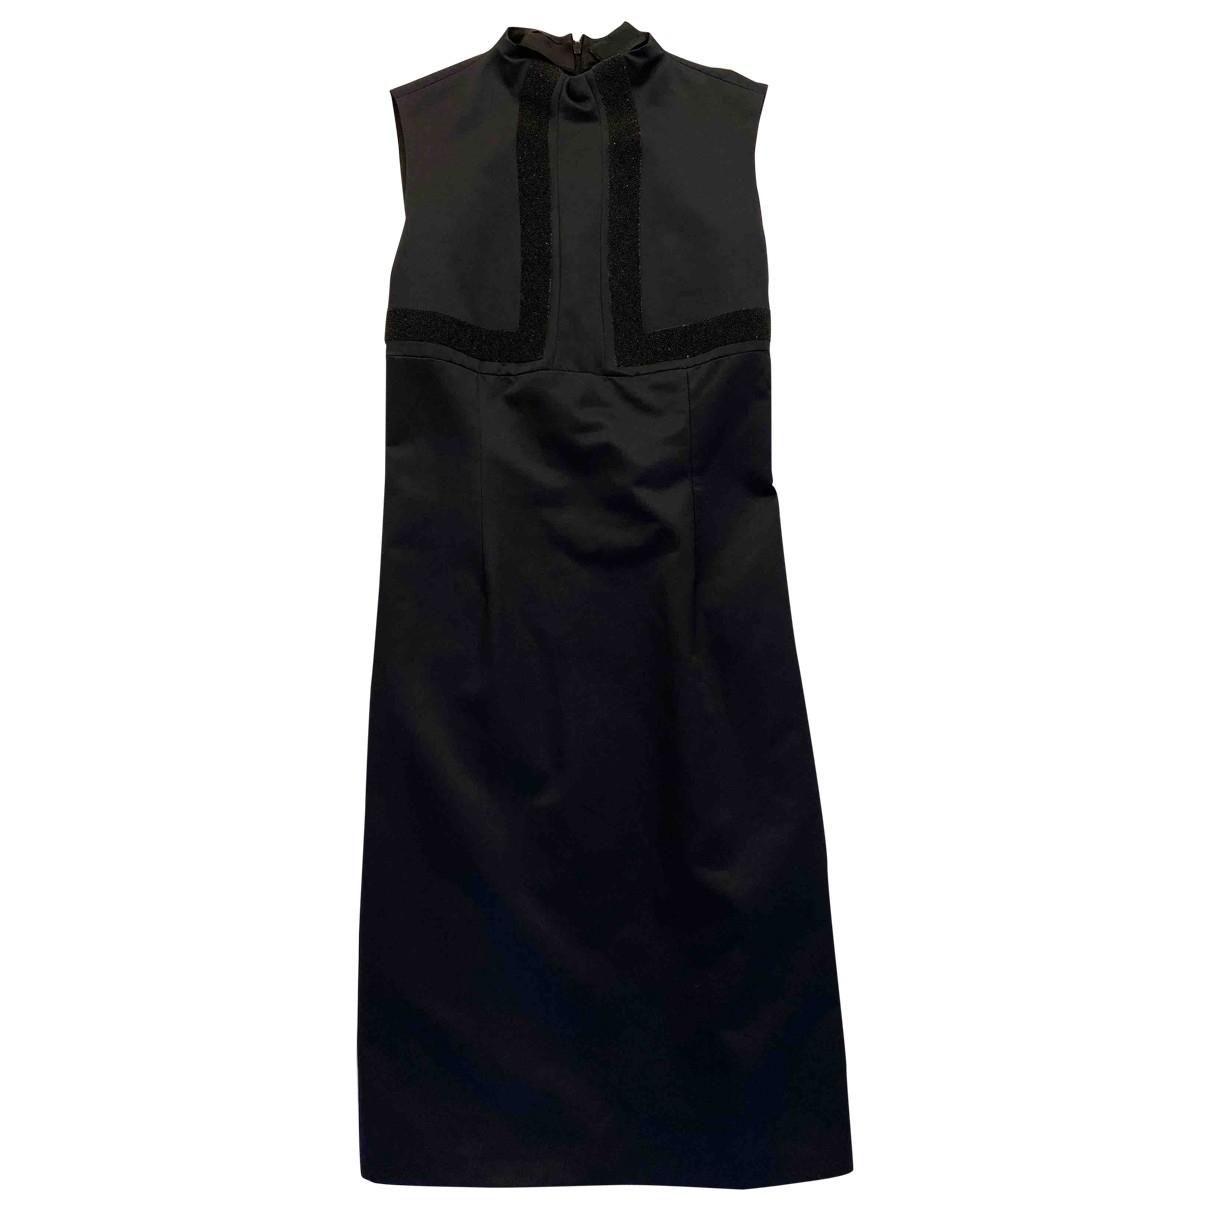 Fendi \N Black Cotton - elasthane dress for Women 42 IT